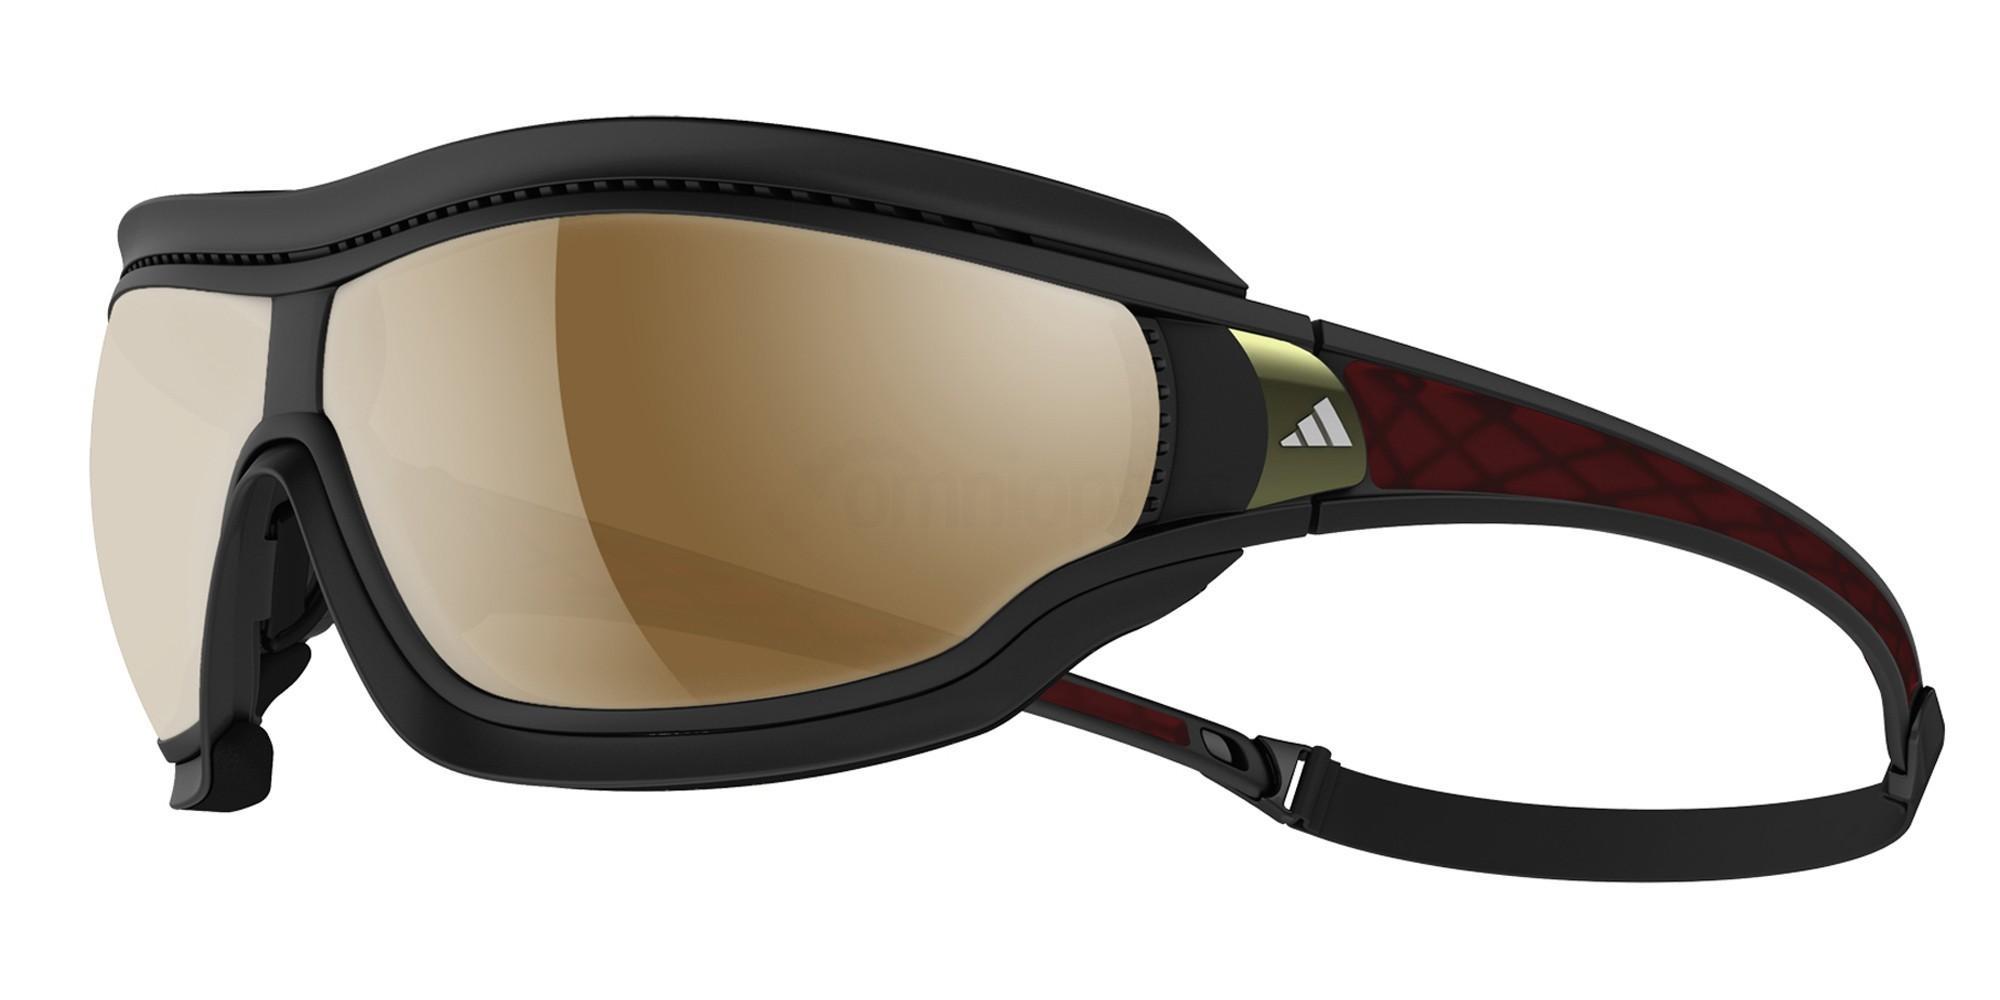 a196 00 6050 a196 Tycane Pro Outdoor L Sunglasses, Adidas